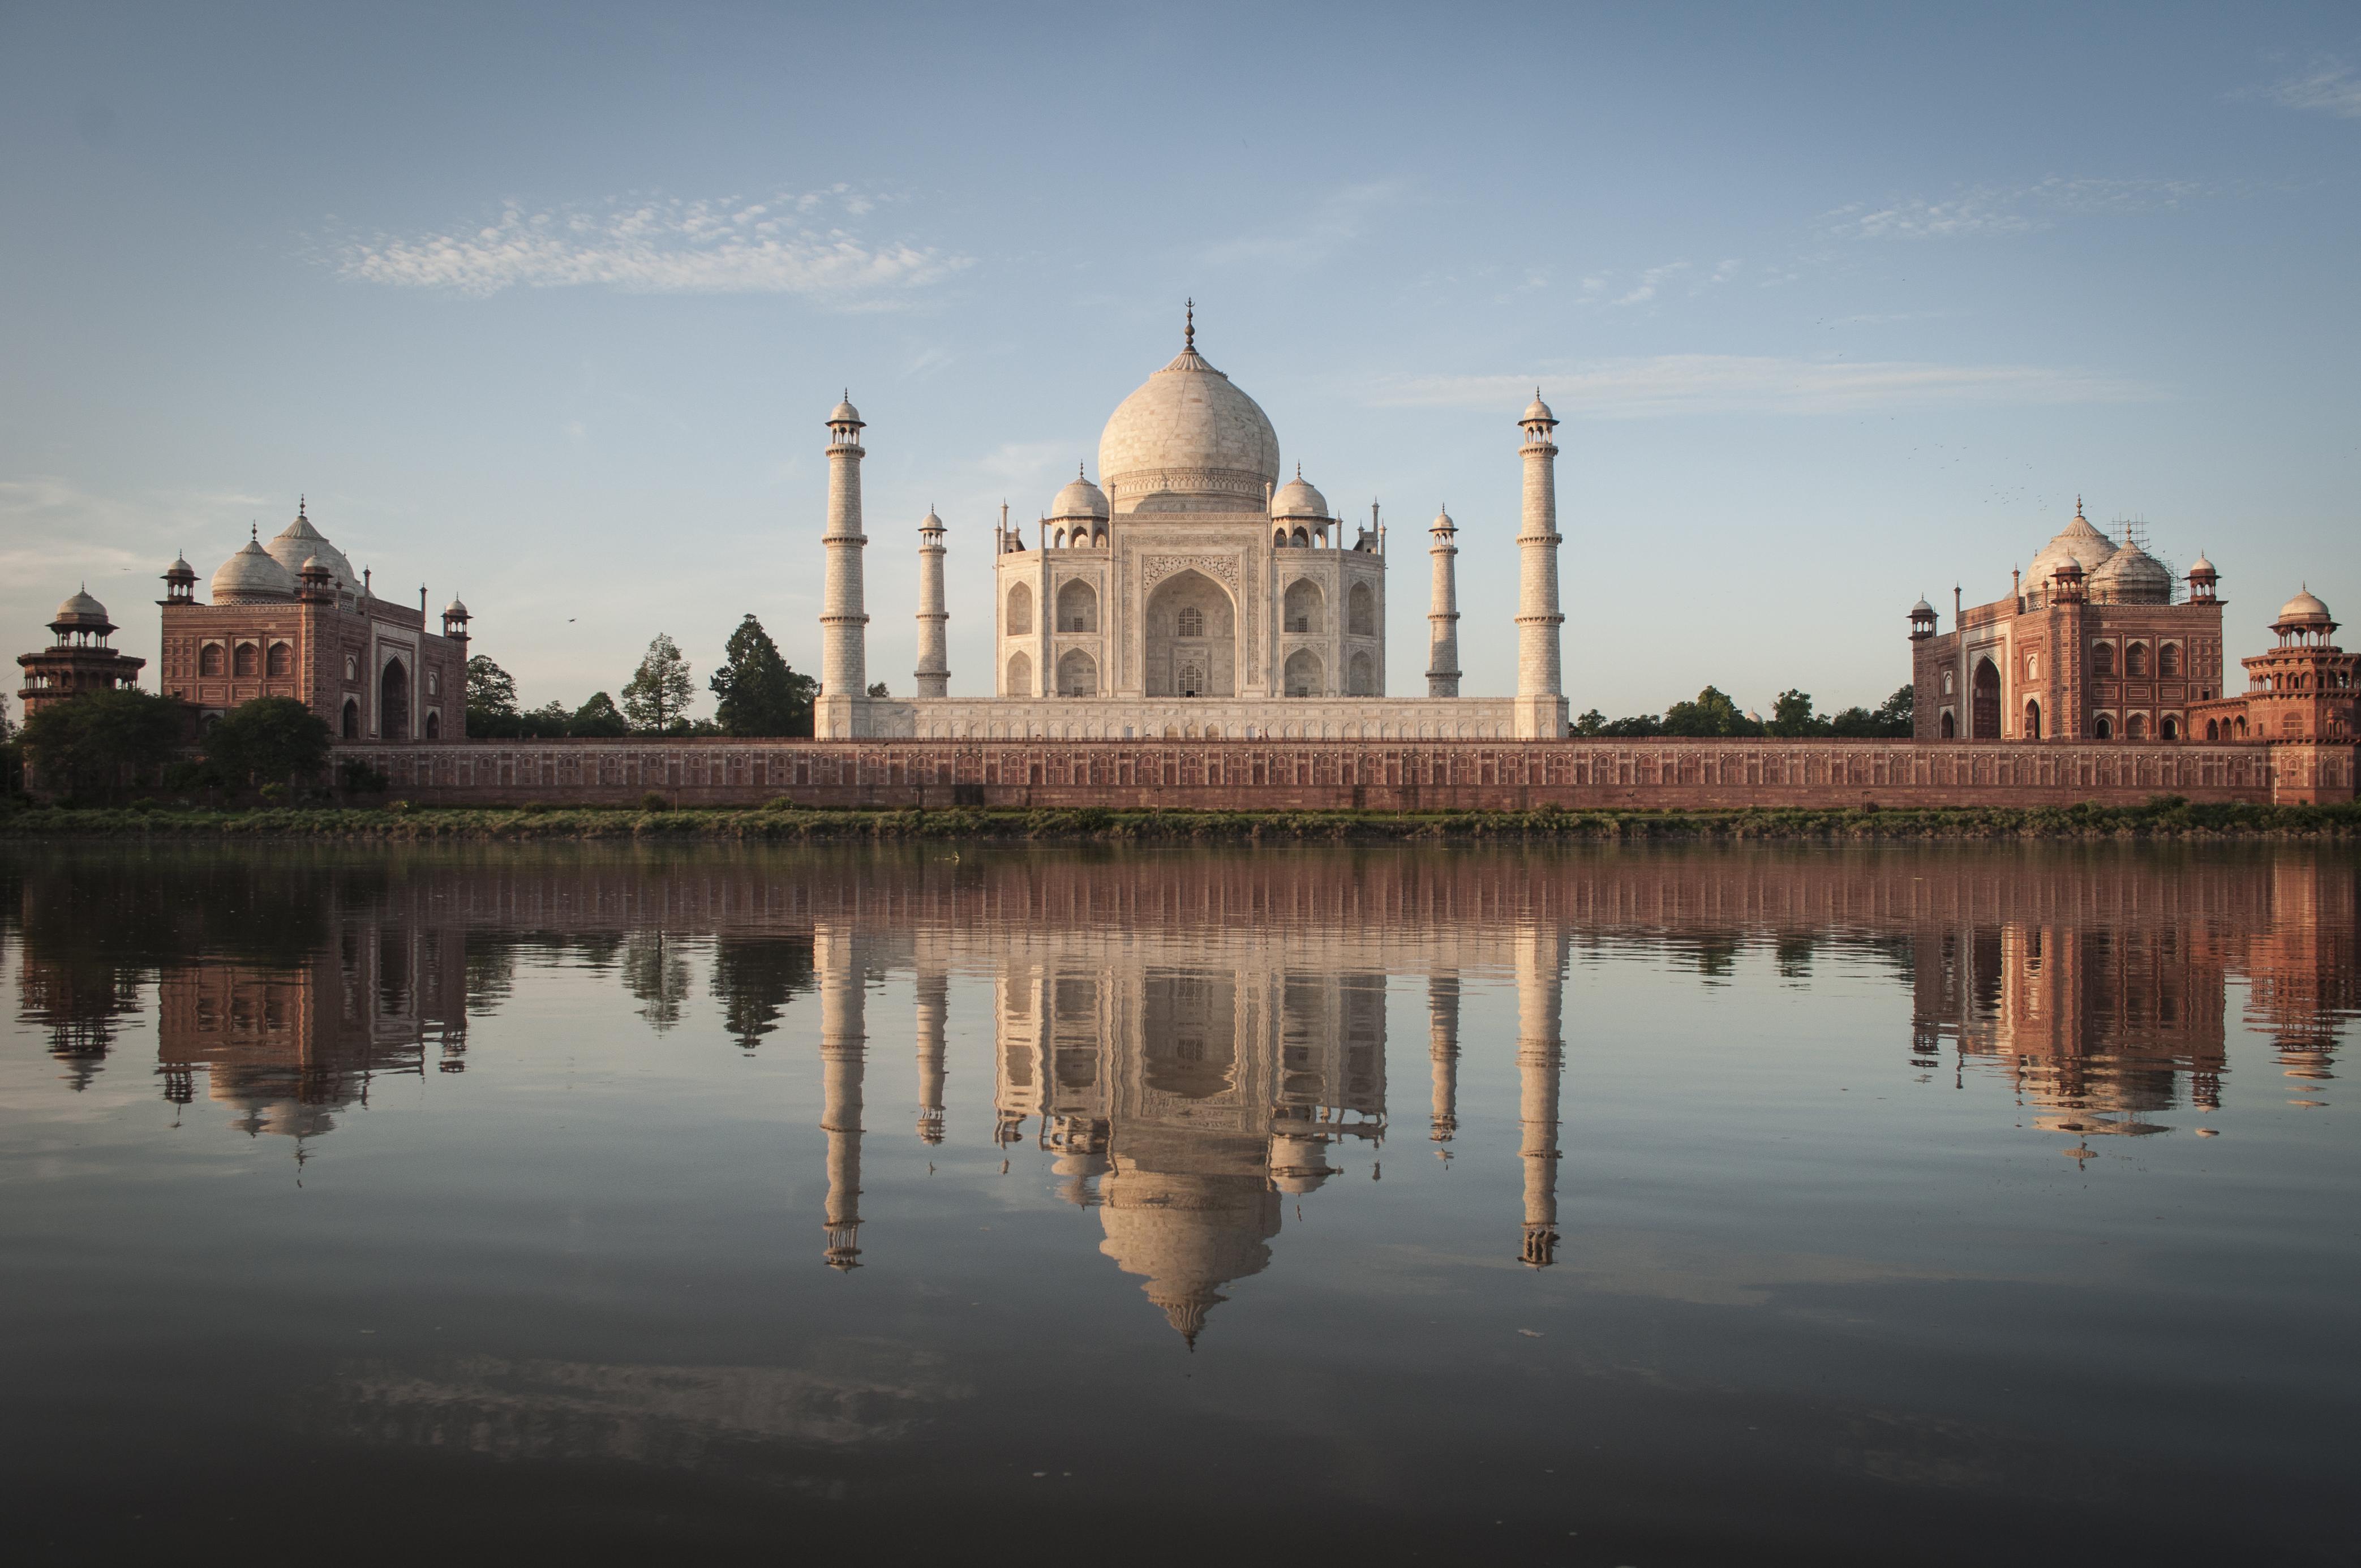 NEW TRIP: 13-Day Best of Northern India with Taj Mahal, Delhi, Jaipur, Ganga, Varanasi